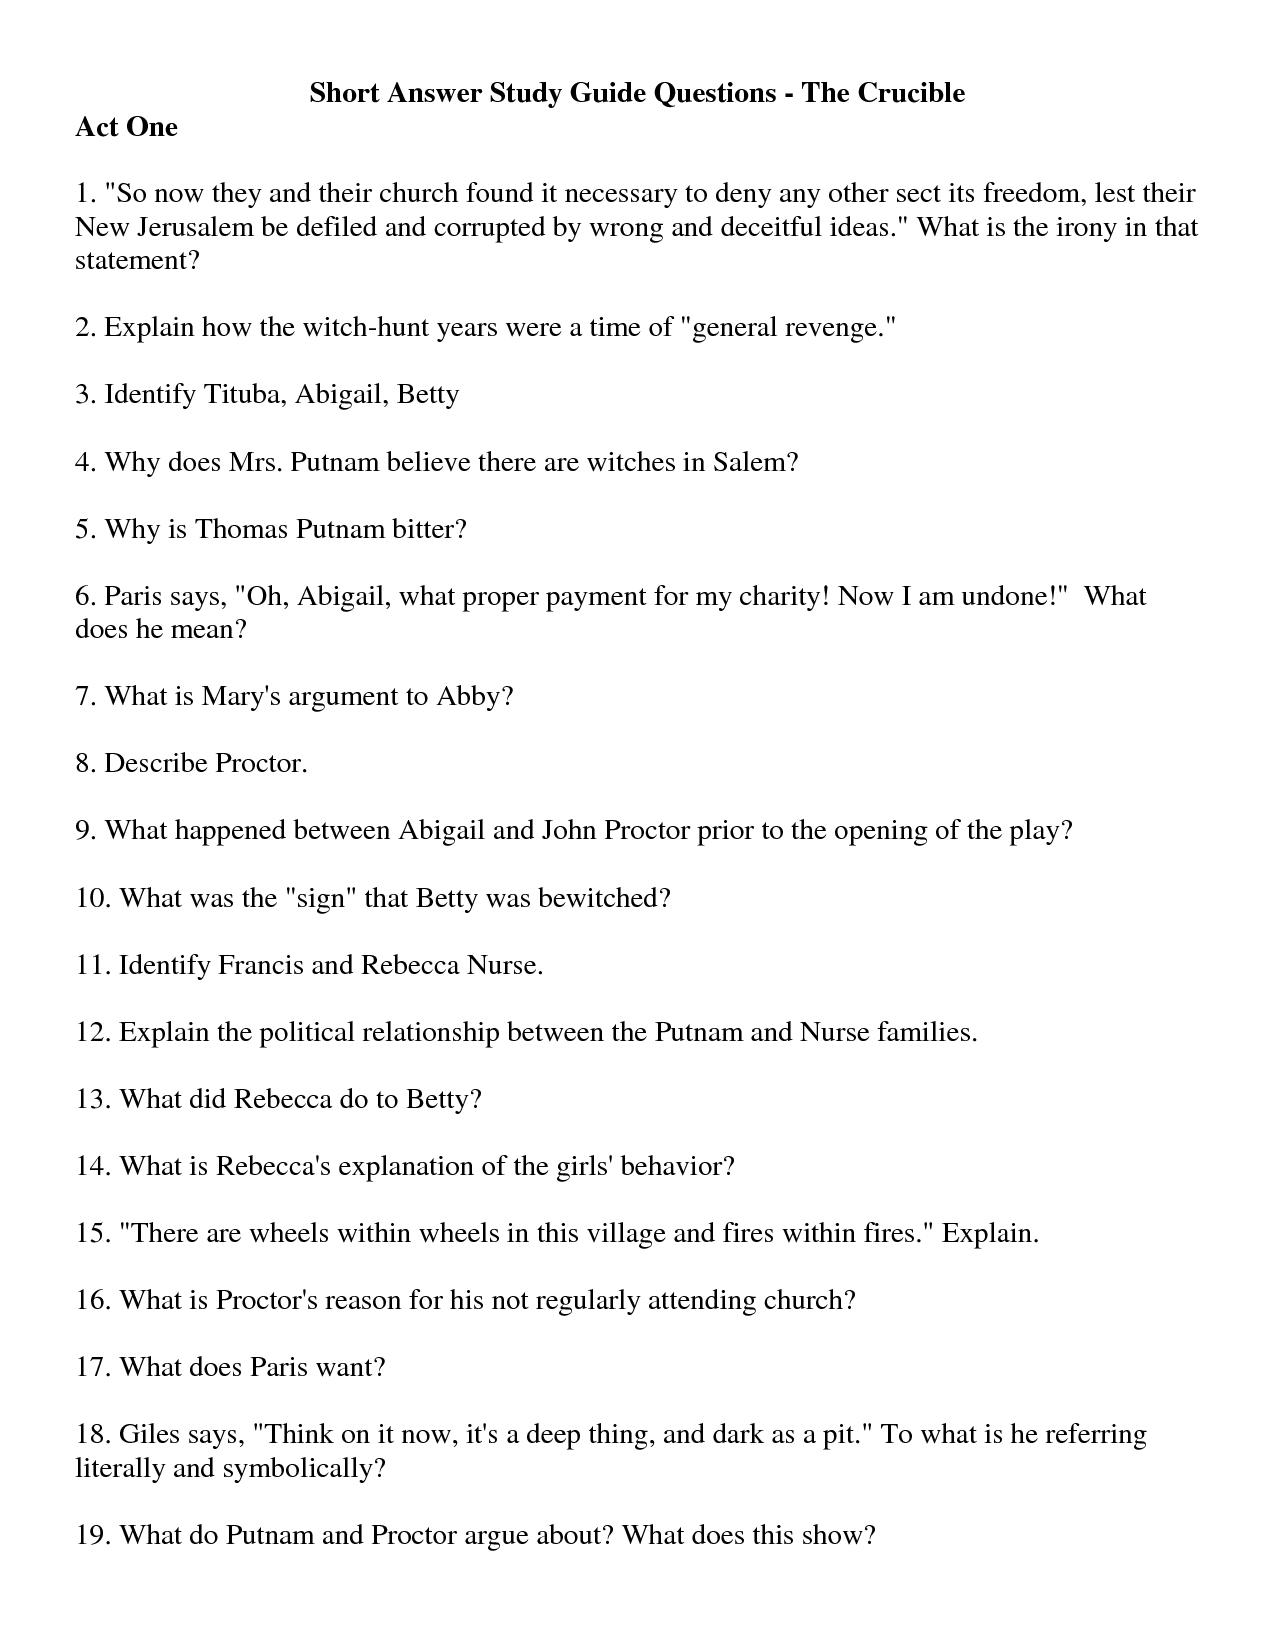 My christmas wish list essay